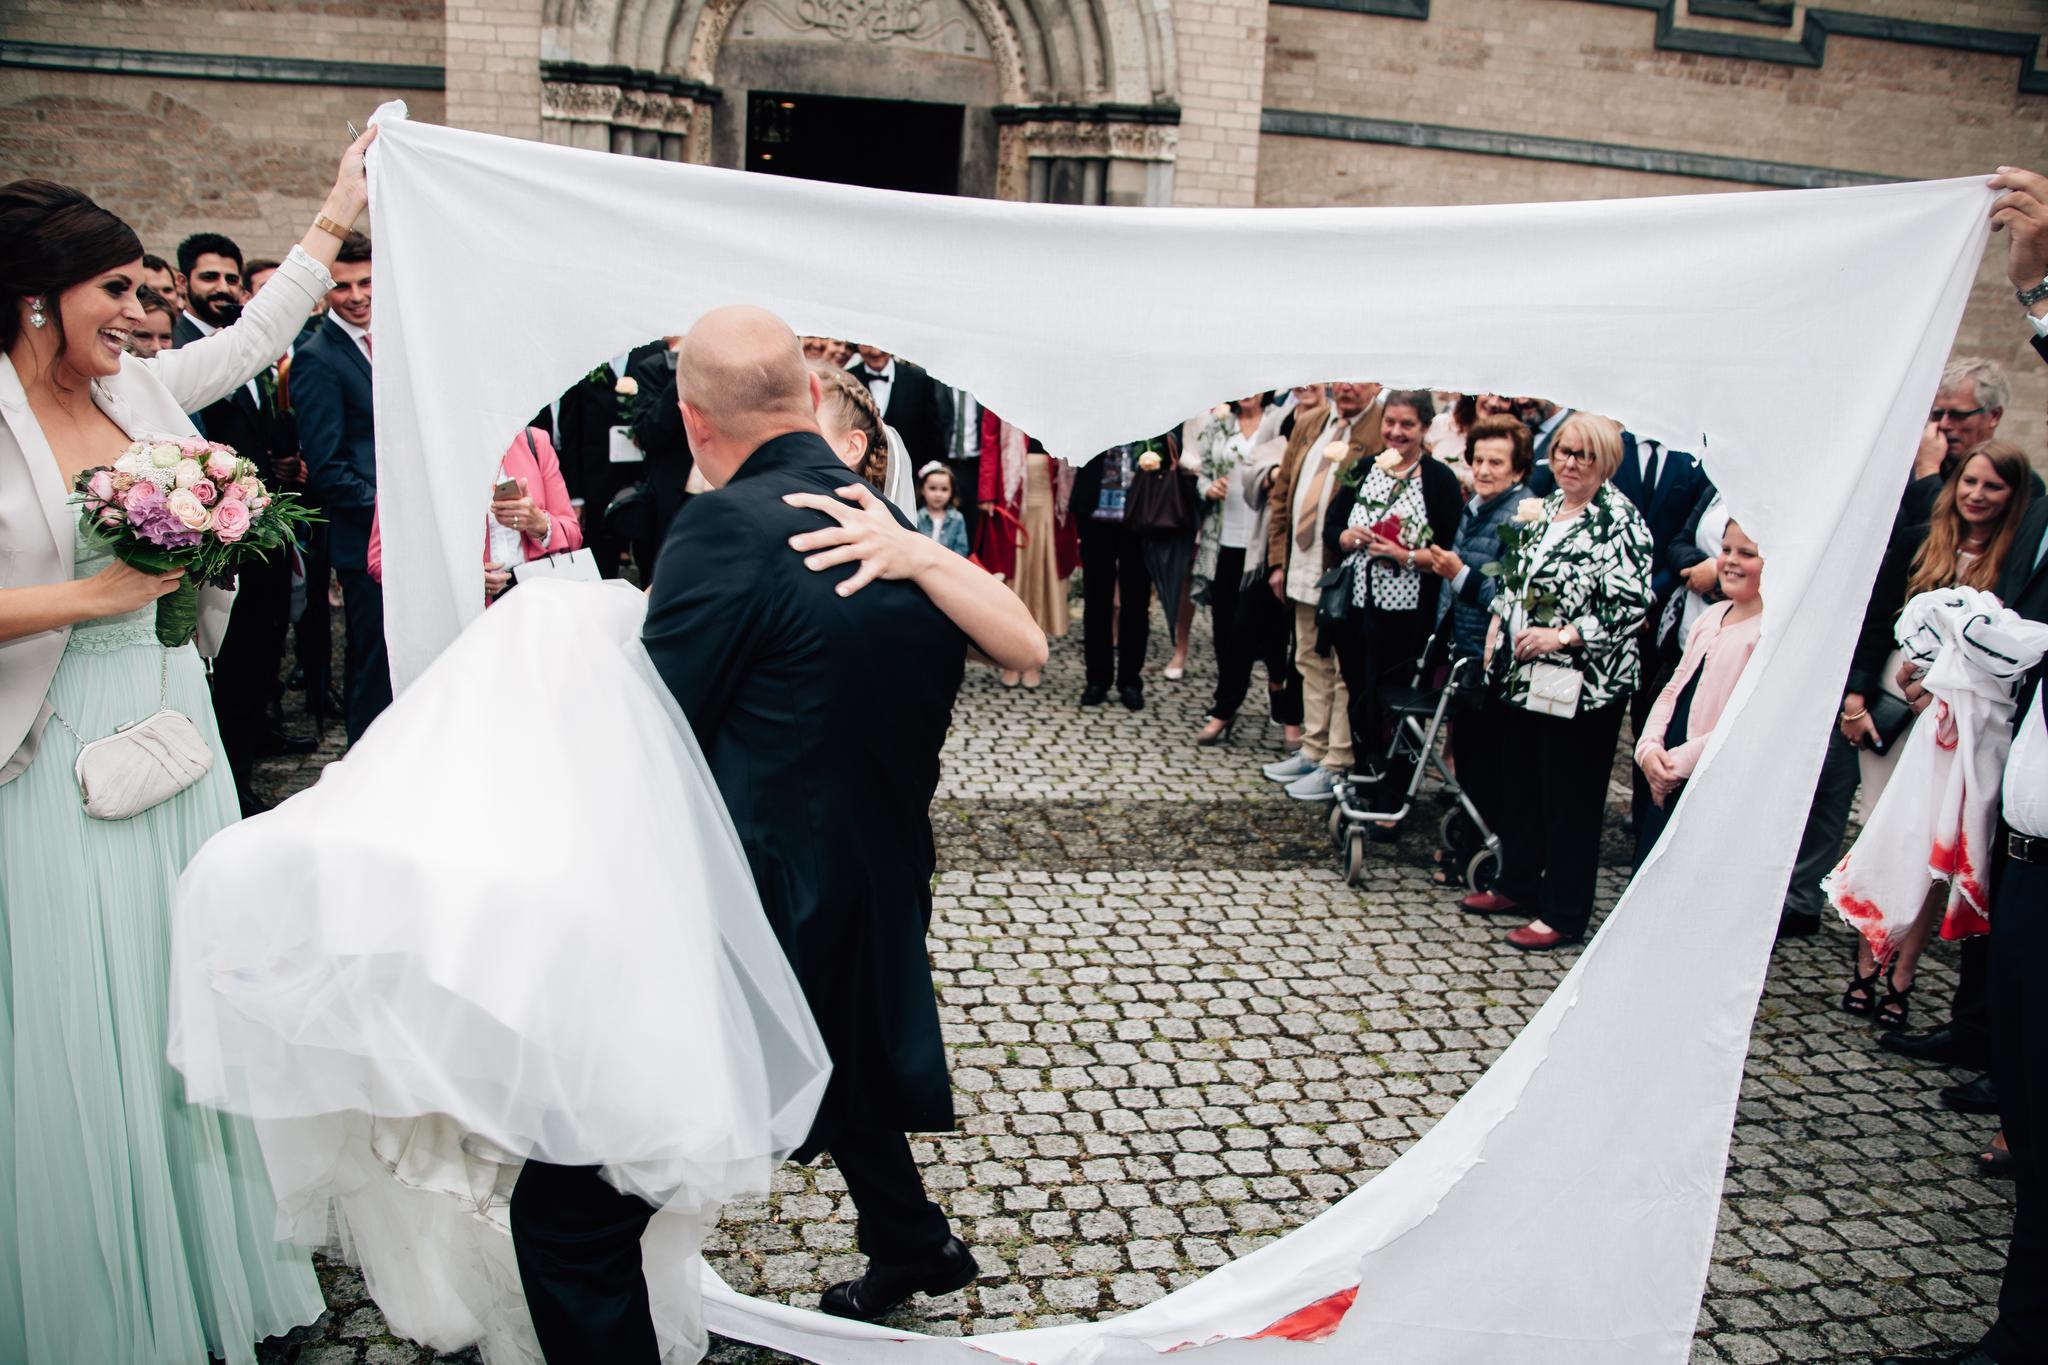 Claudia Krawinkel Fotografie Hochzeitsfotograf Essen Düsseldorf Dormagen Kloster Knechtsteden Hochzeitsreportage Hochzeit Knechtsteden94